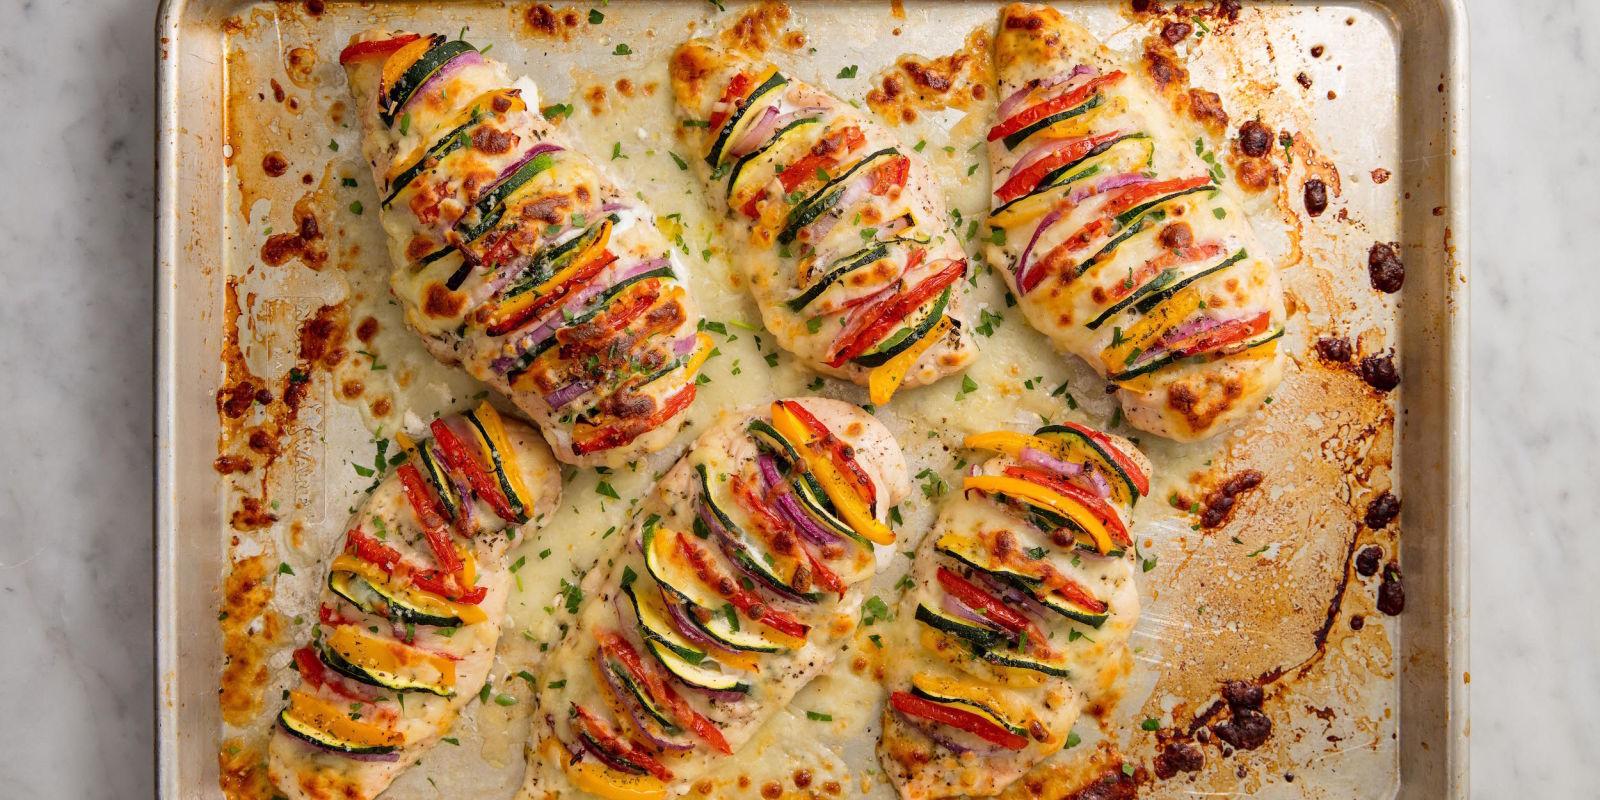 Best Primavera Stuffed Chicken Recipe How To Make Primavera Stuffed Chicken